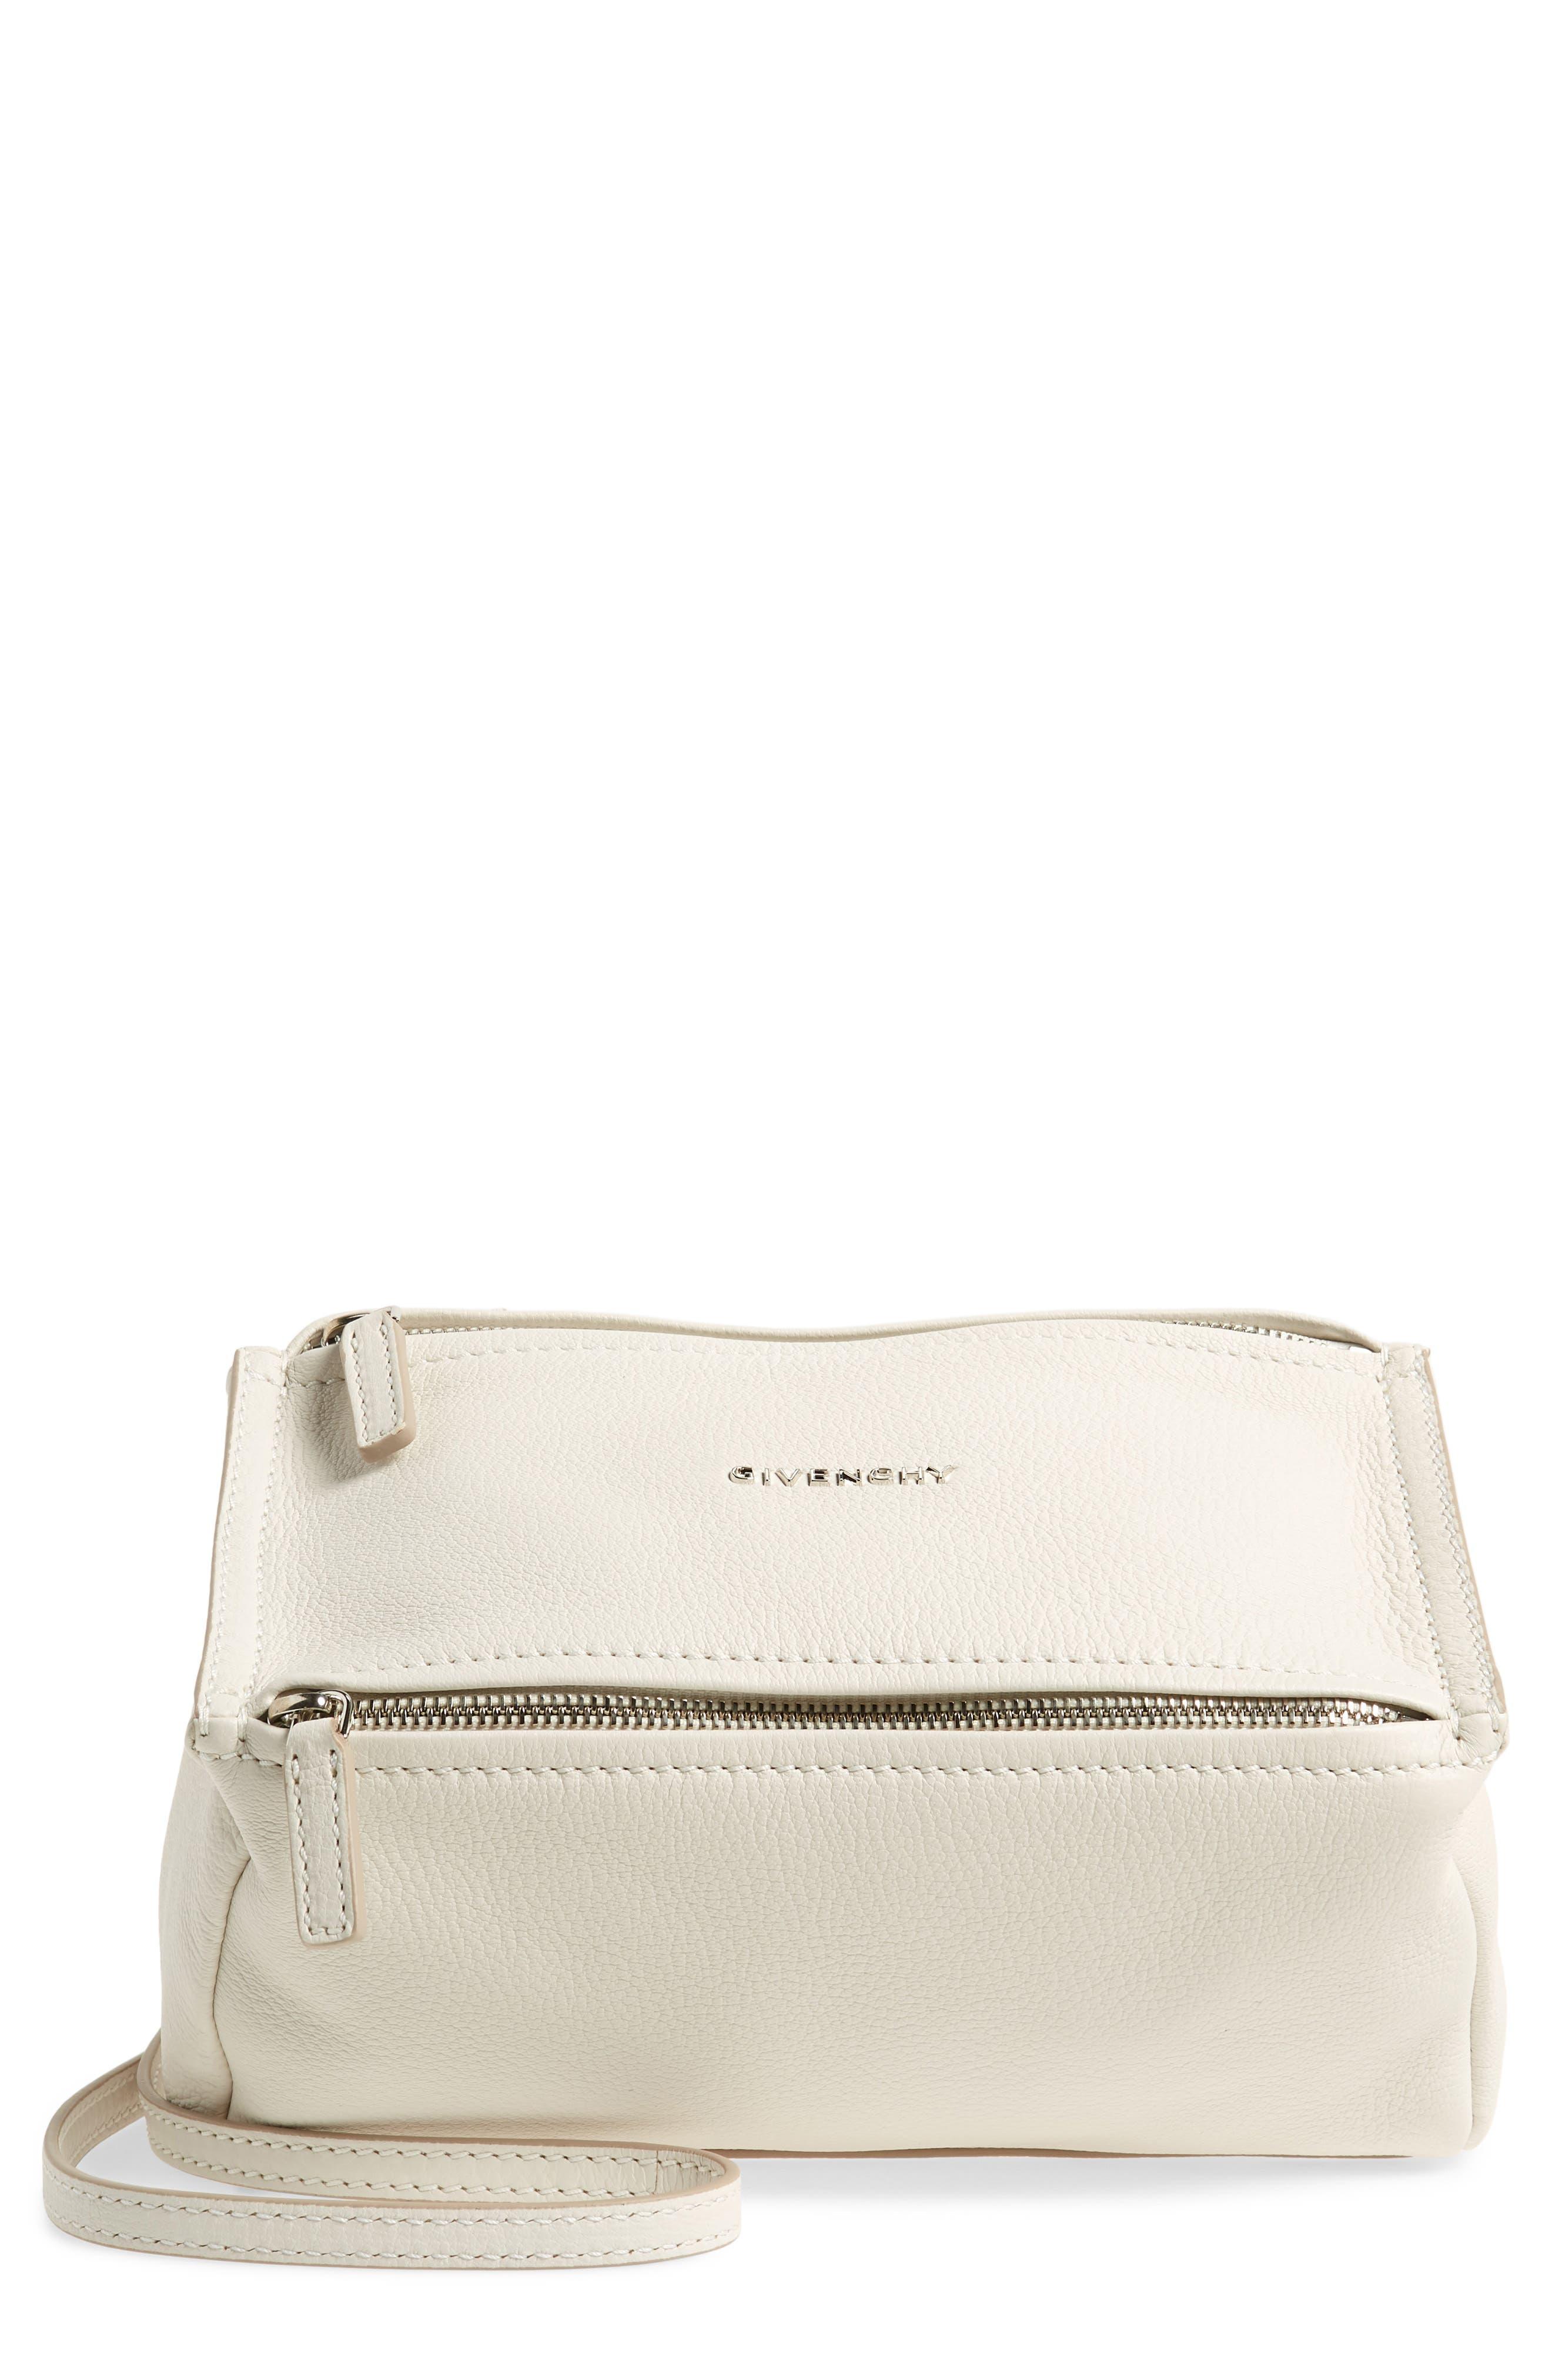 'Mini Pandora' Sugar Leather Shoulder Bag, Main, color, WHITE